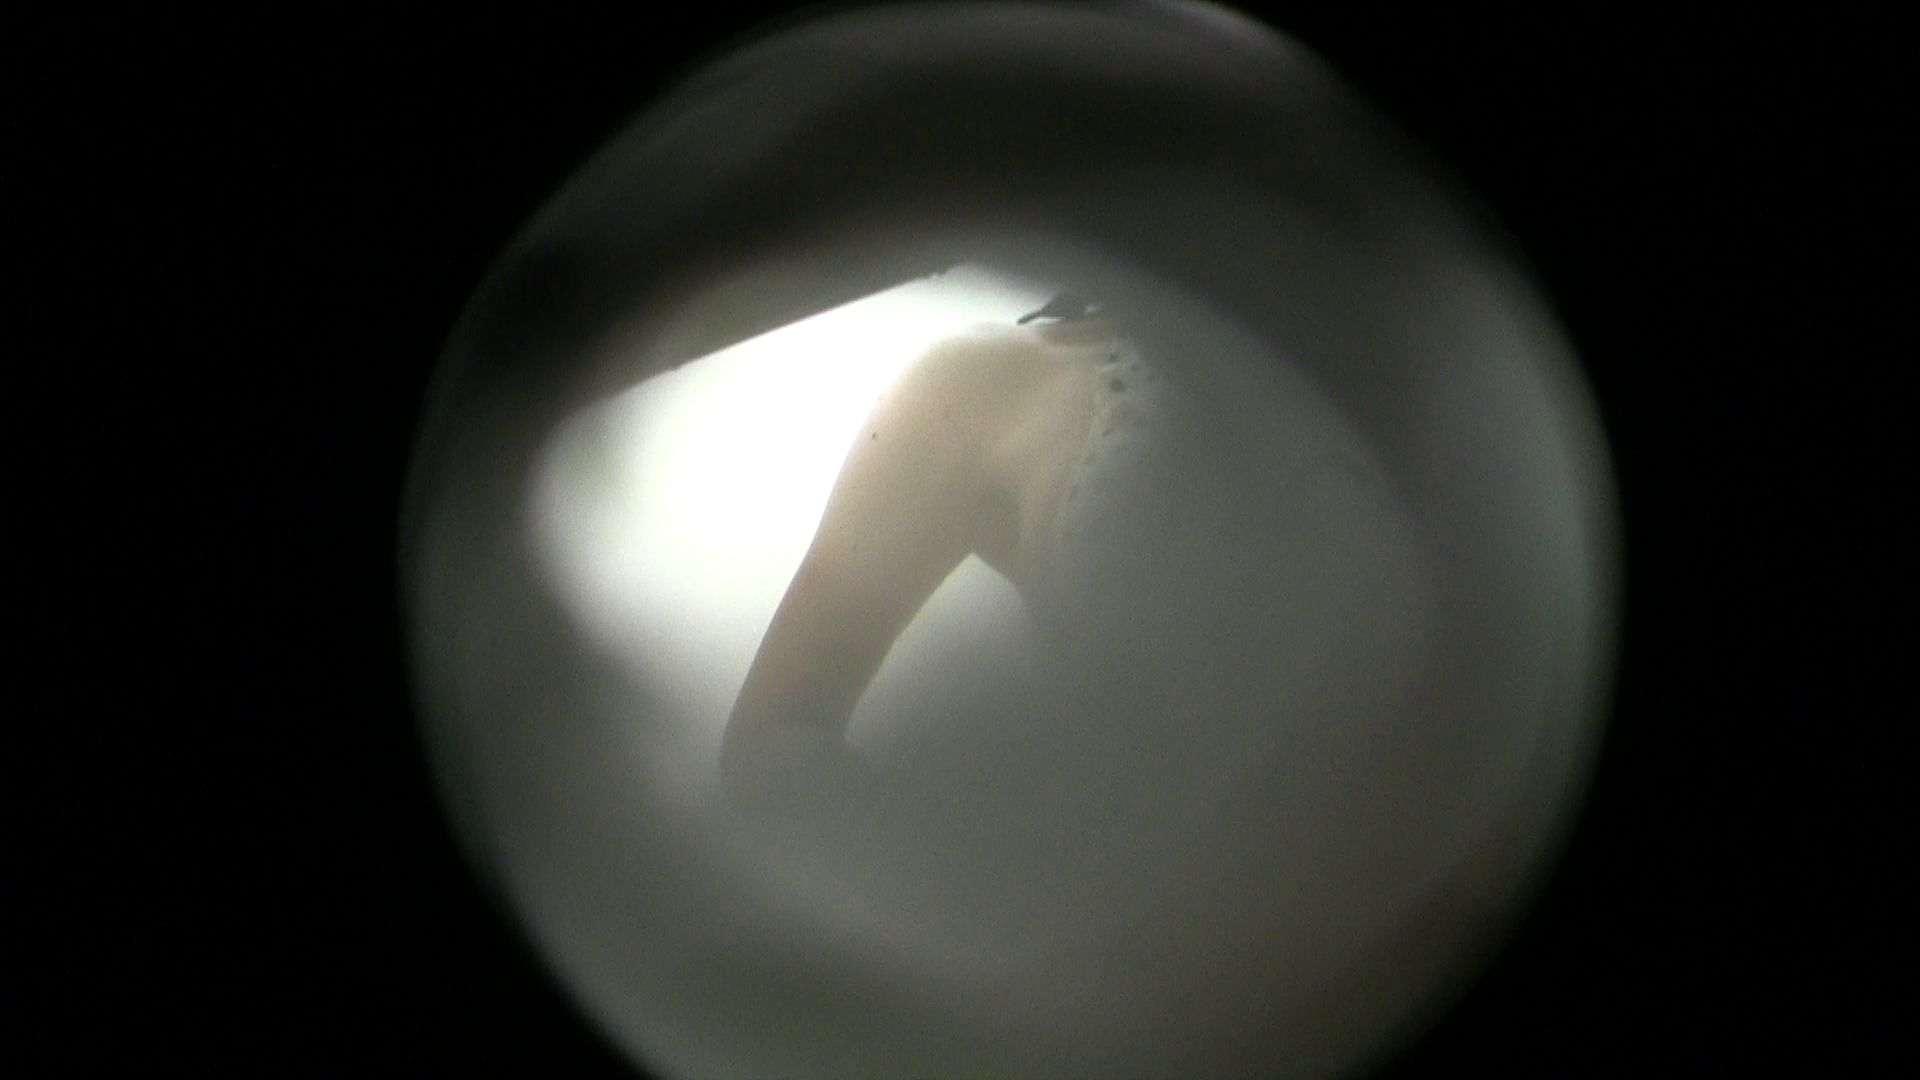 NO.35 勃起力の高い乳首を持つ年増 アラ30 エロ画像 53画像 4